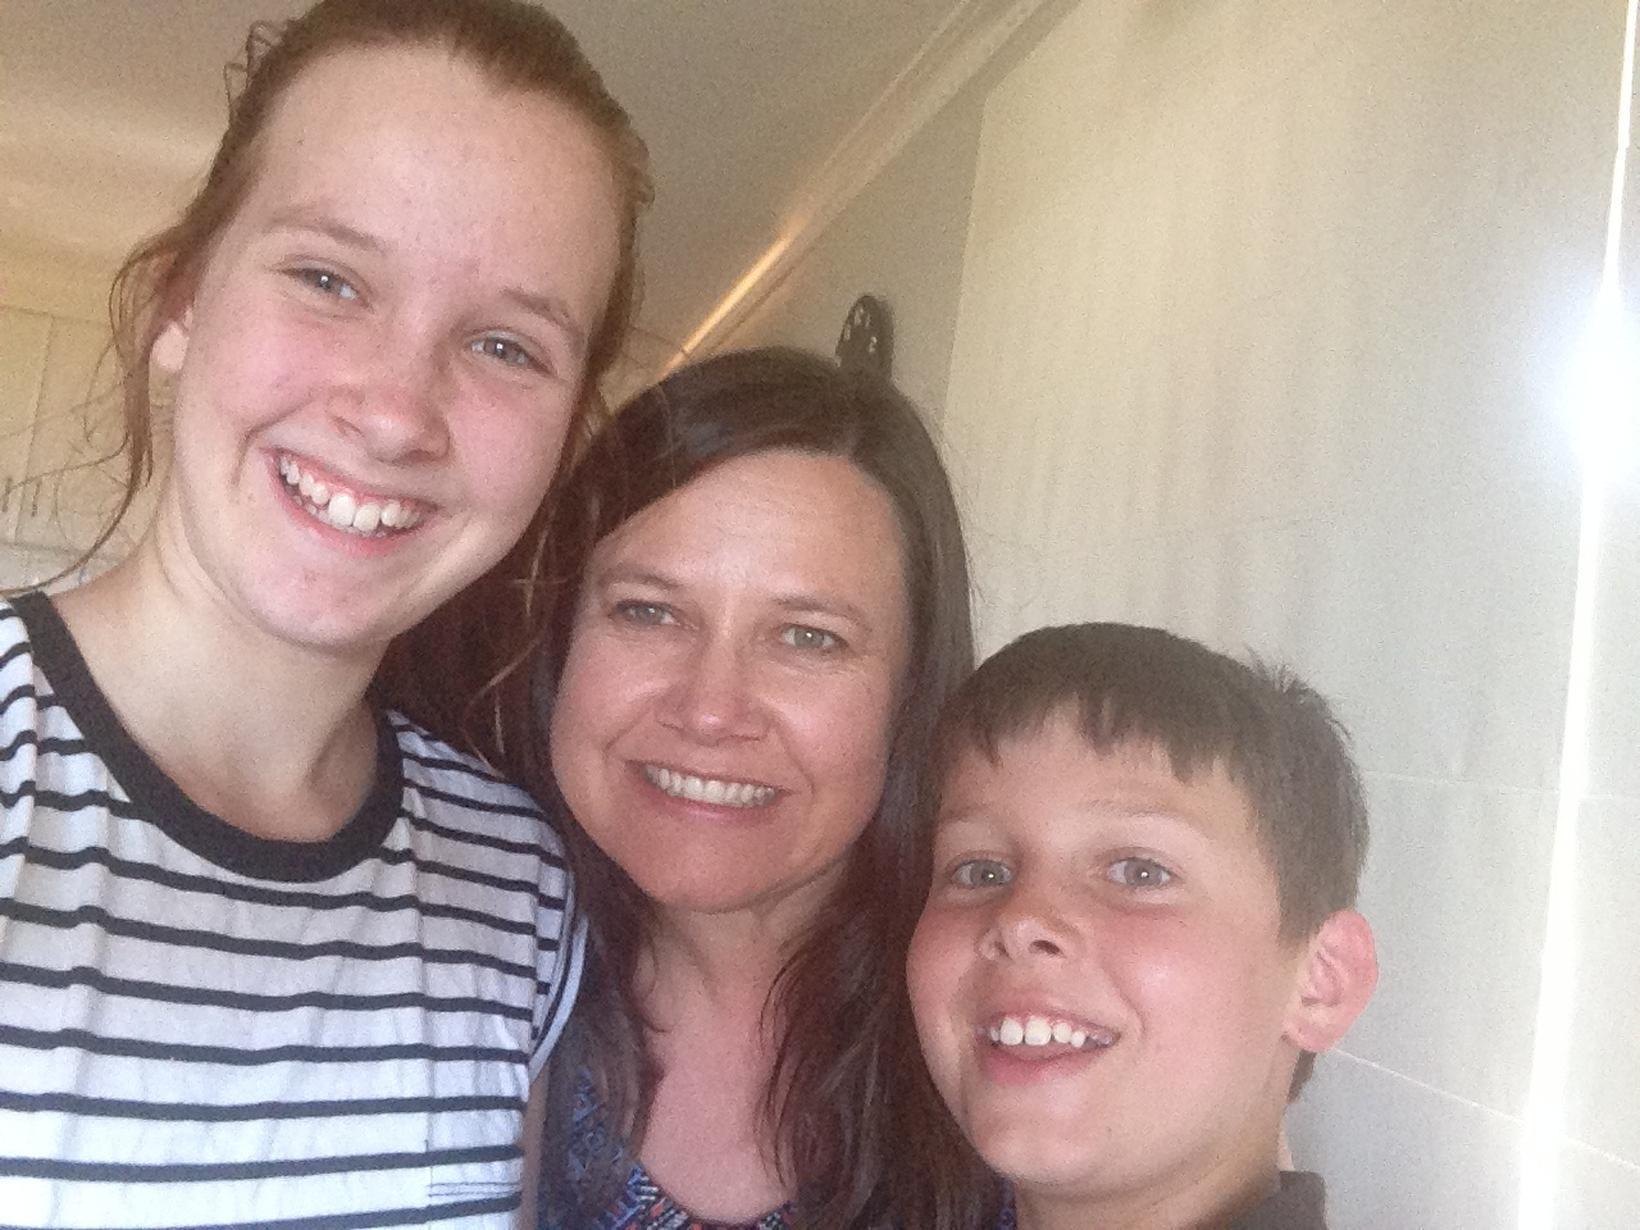 Karen & Steve from Launceston, Tasmania, Australia